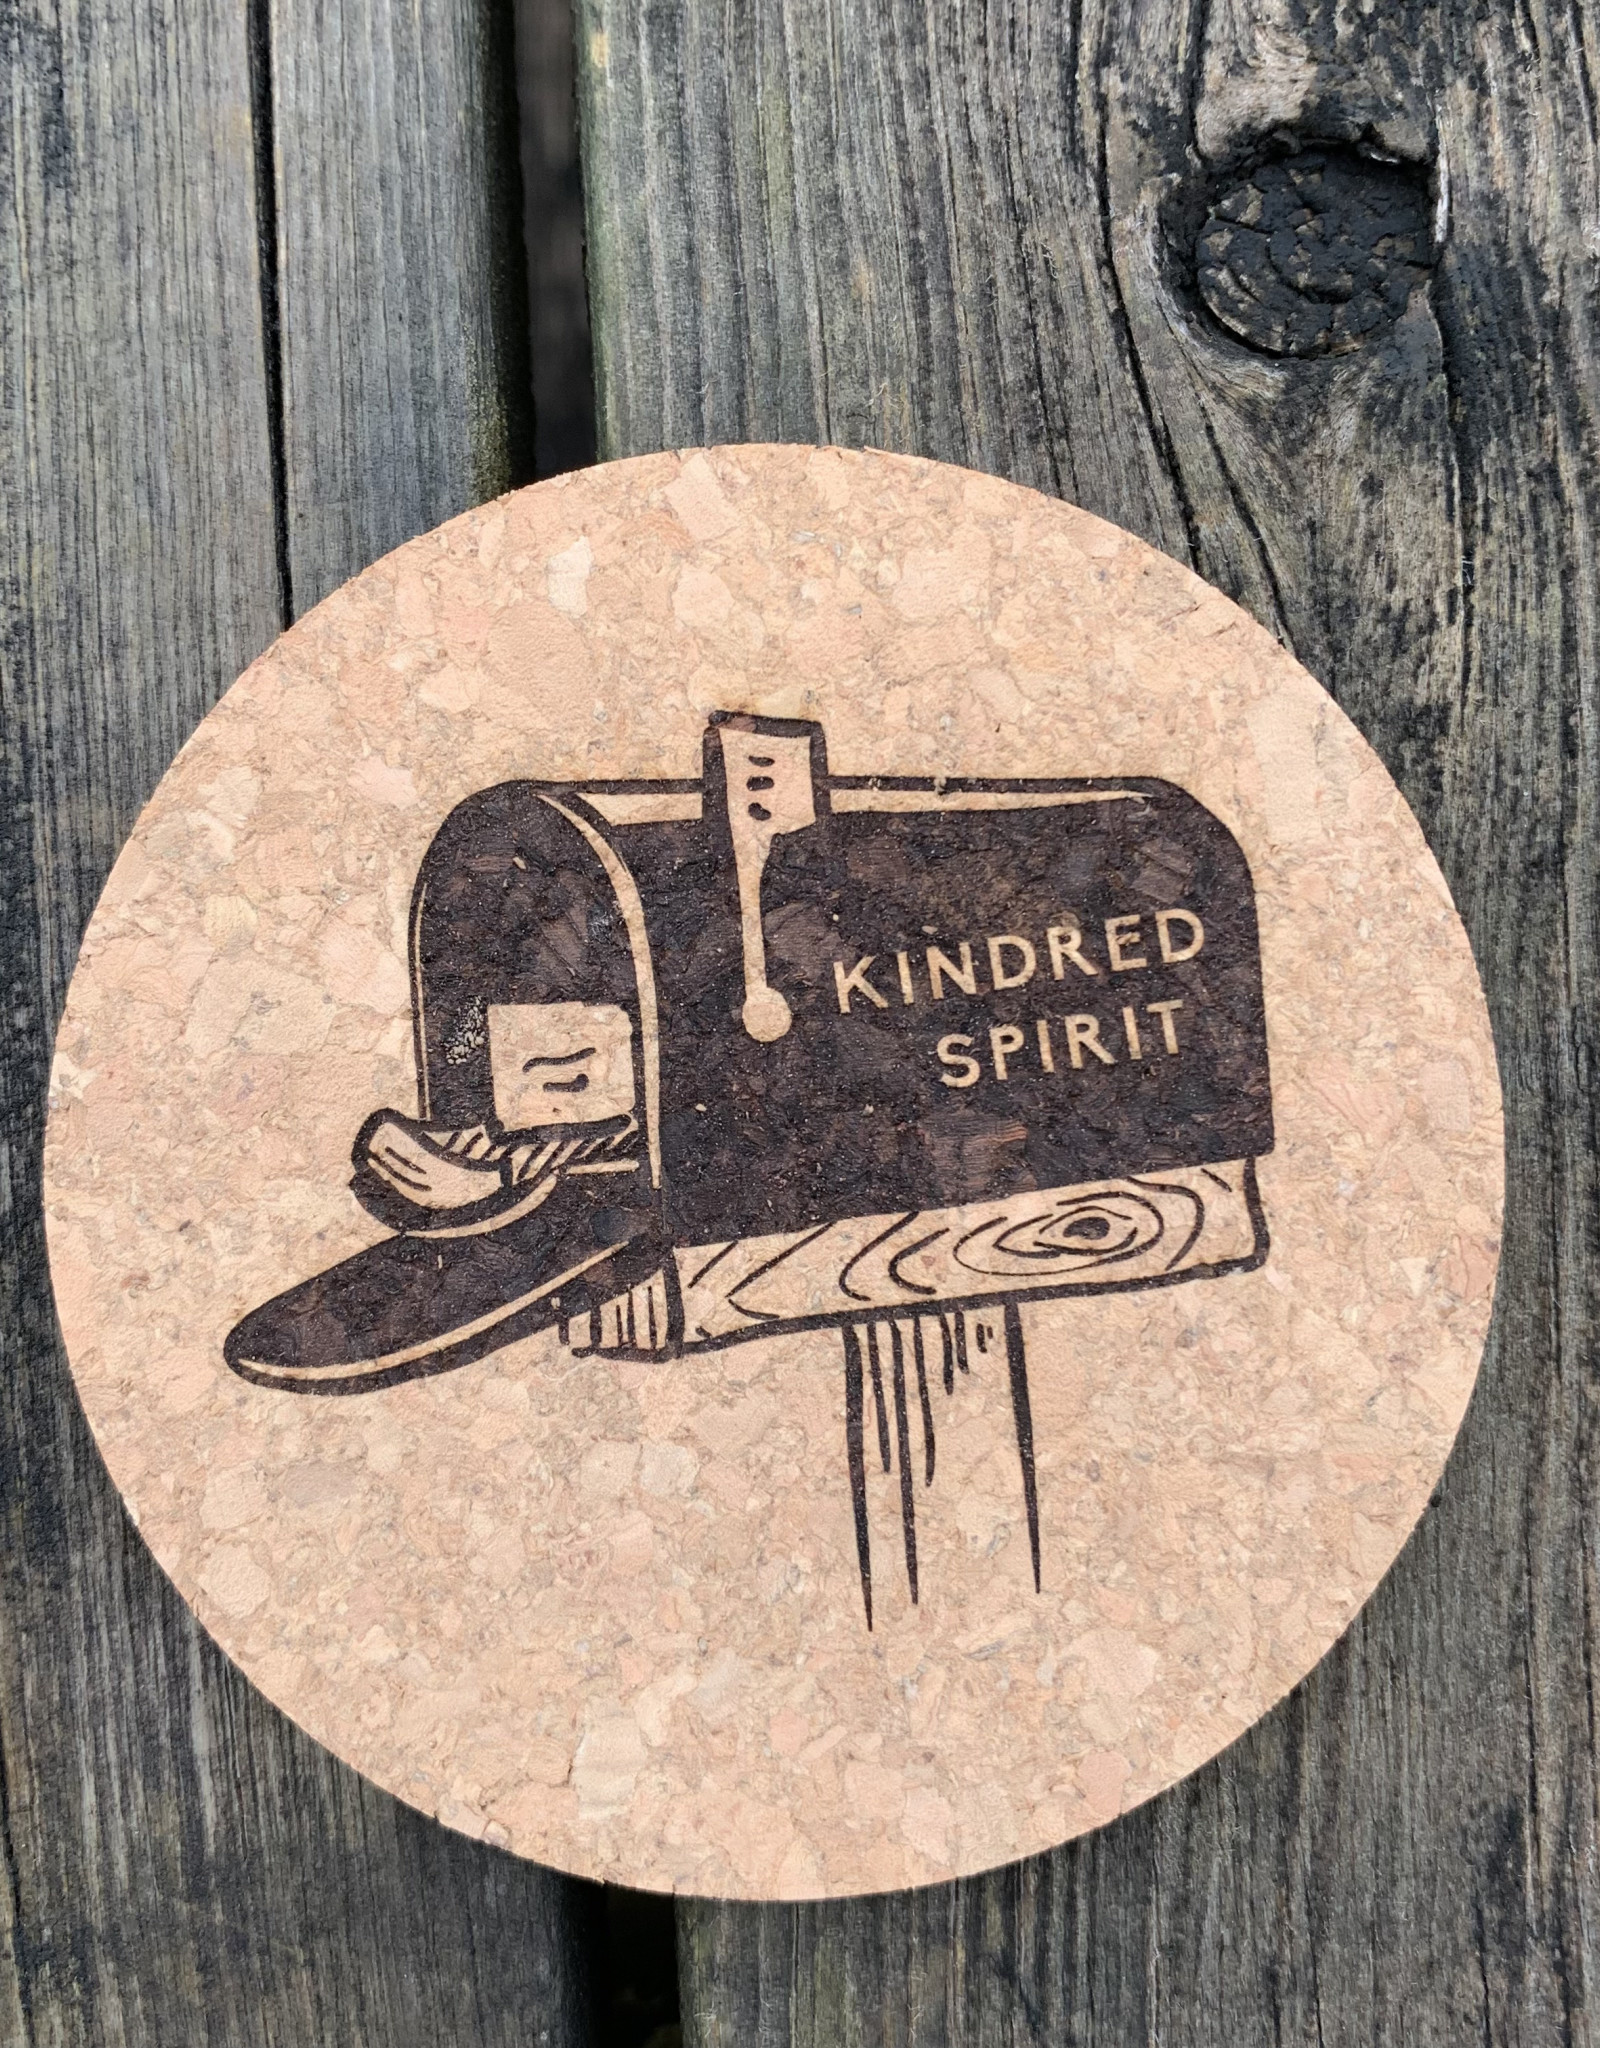 sbncfish KINDRED SPIRIT ROUND CORK COASTER